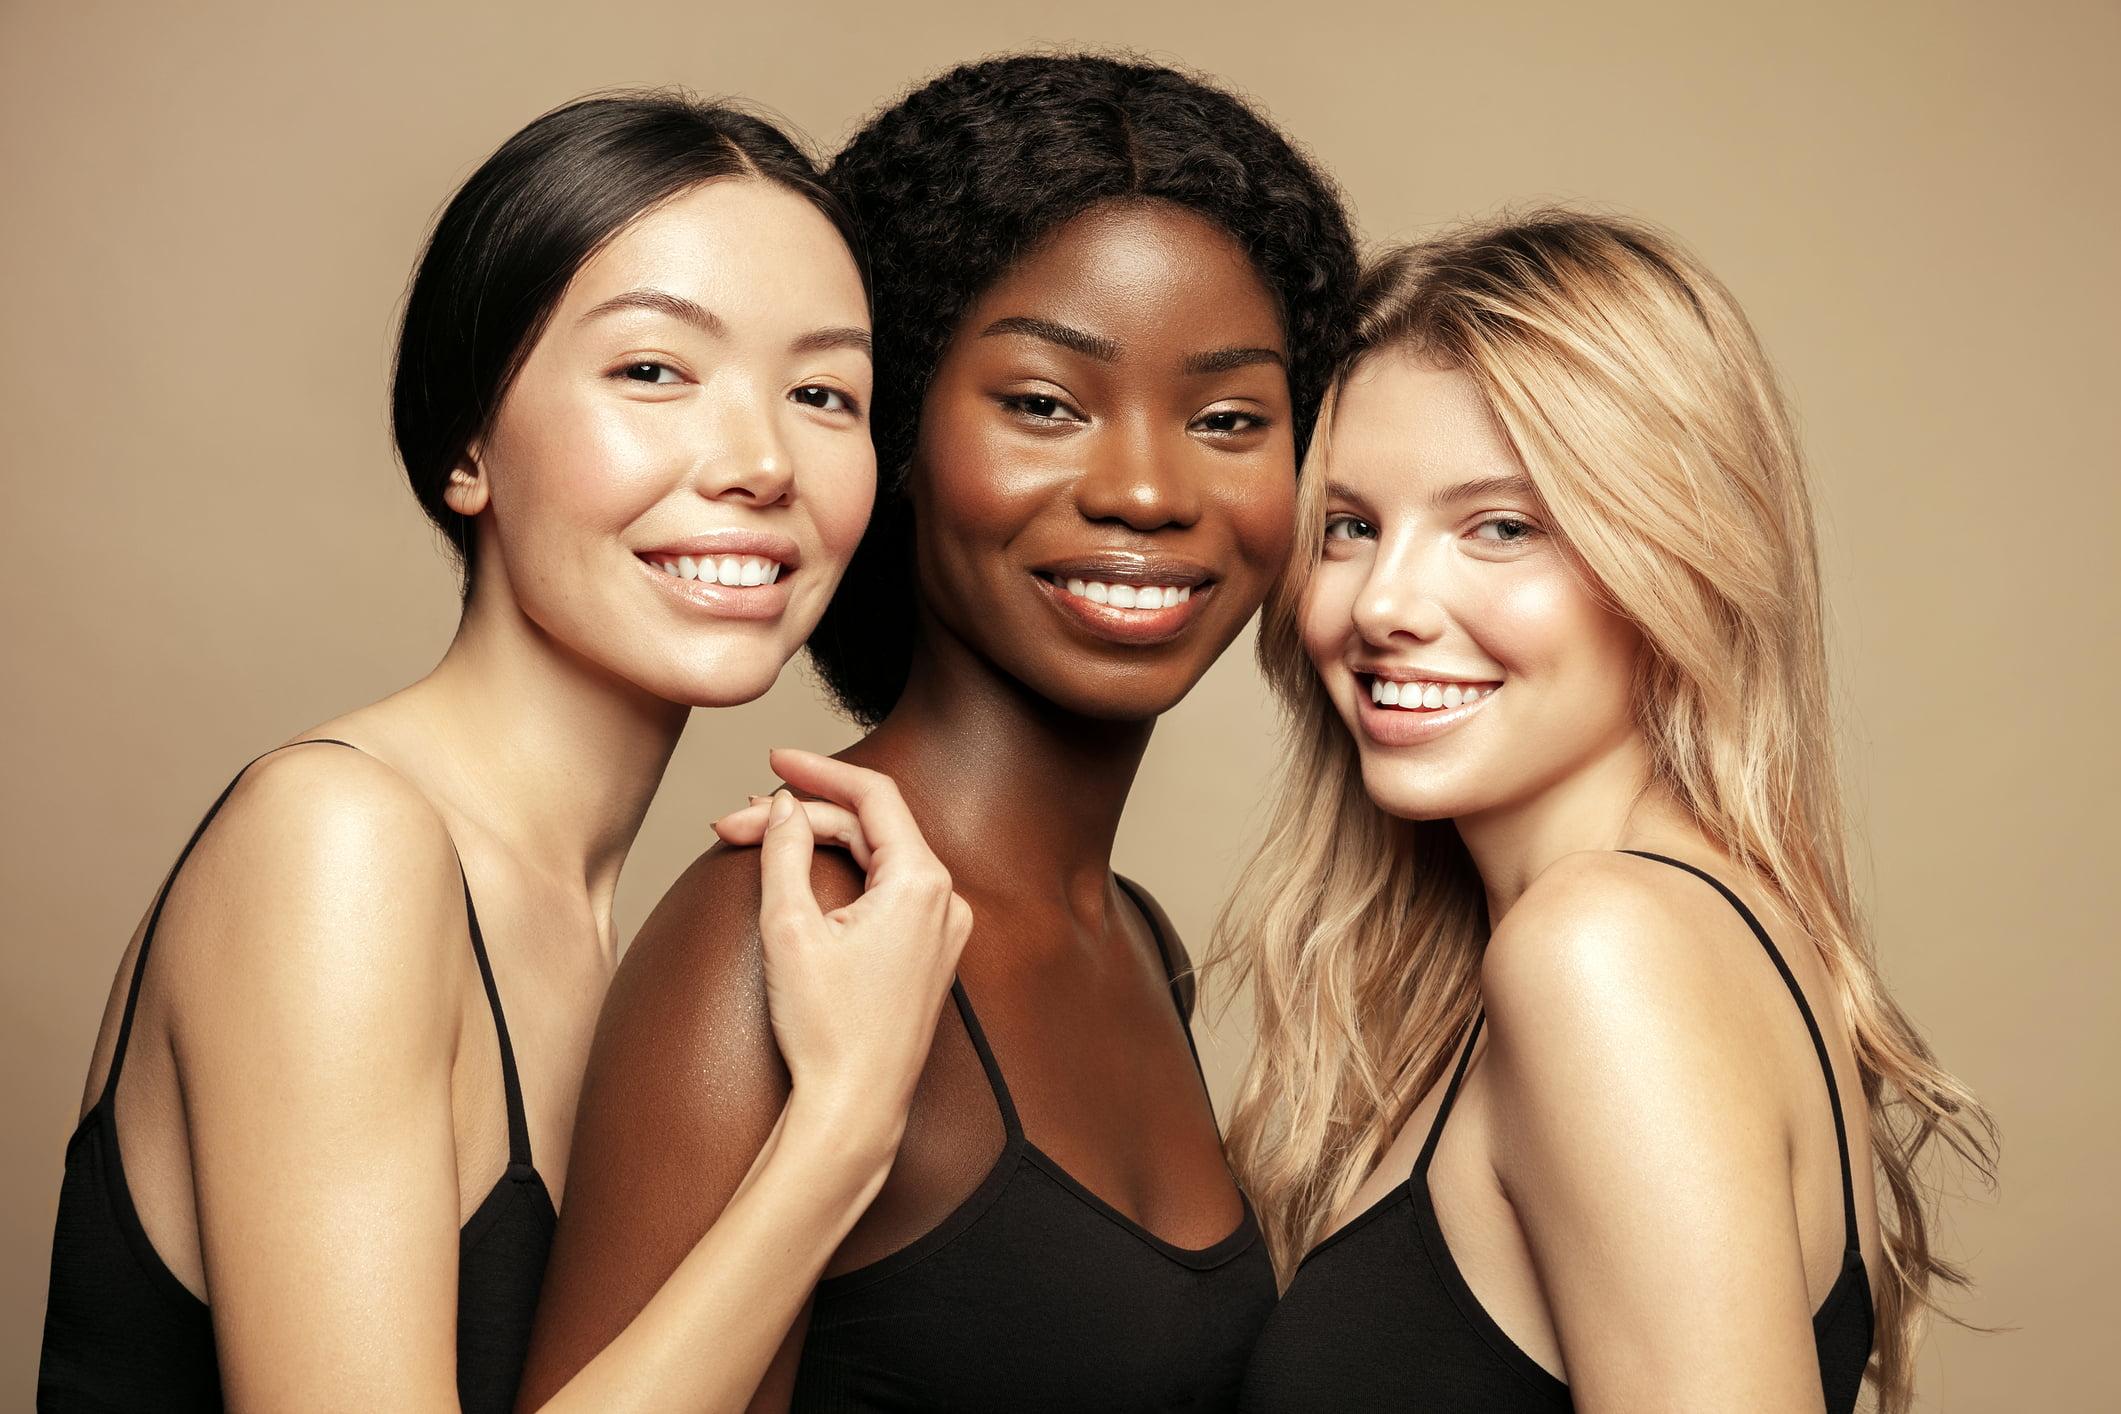 3 pretty women